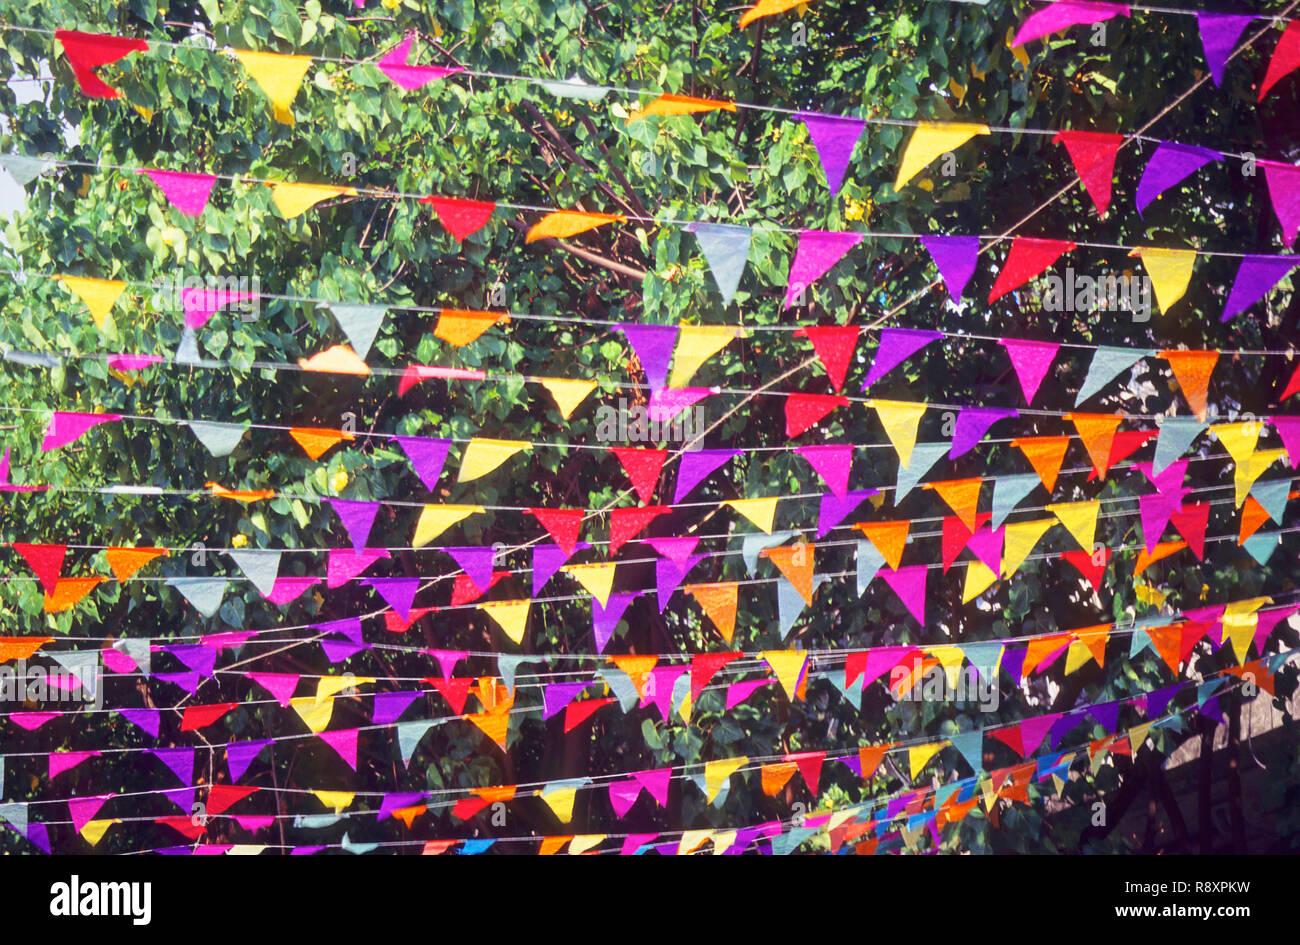 Colorful decoration - Stock Image